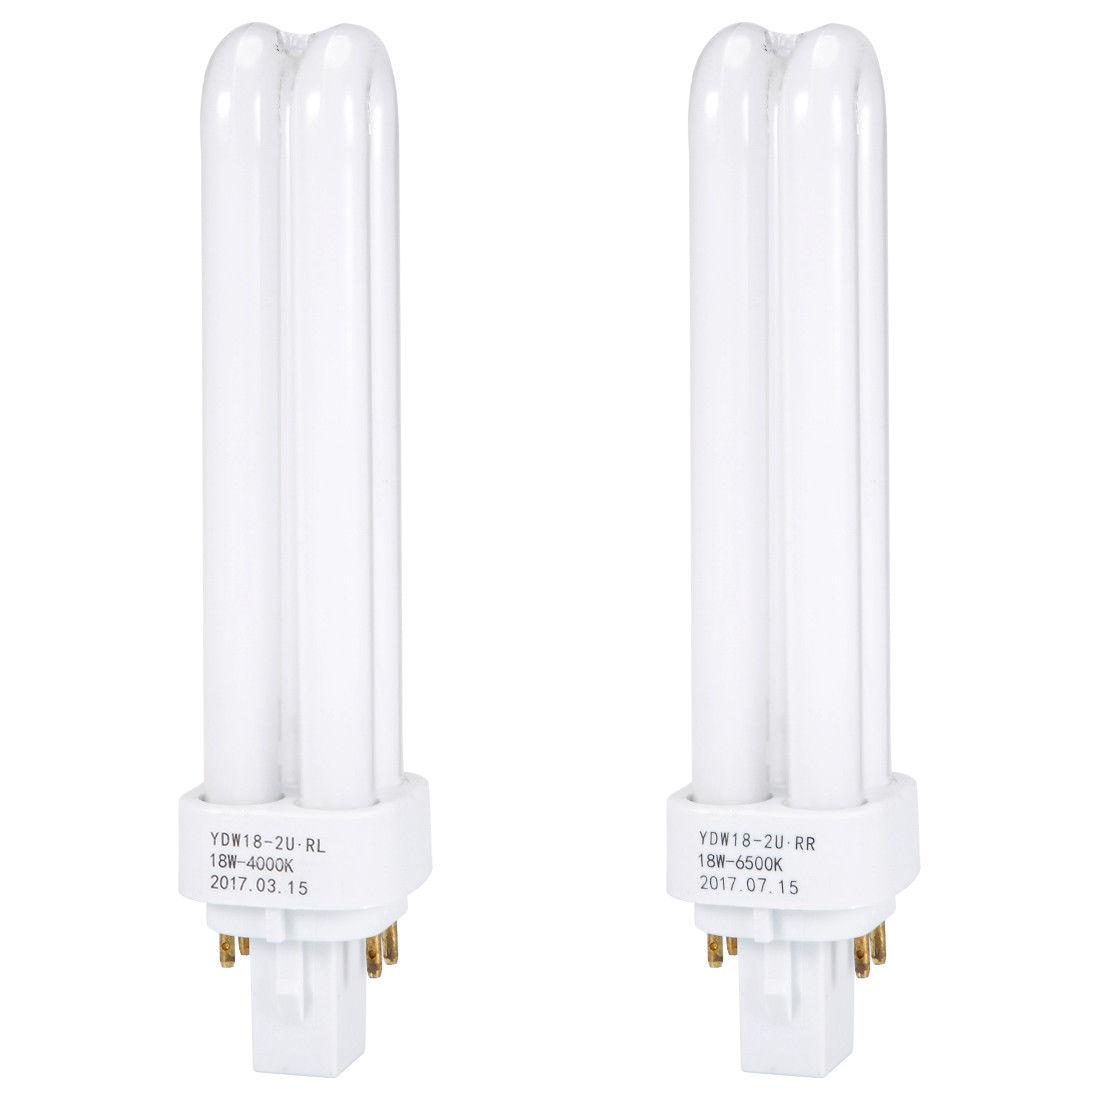 6 92 Aud 18w Pl C Lamp Bulb Double U Tube G24 Q 4 Pin Base 4000k Warm White Ac 220v Ebay Home Garden Lamp Bulb